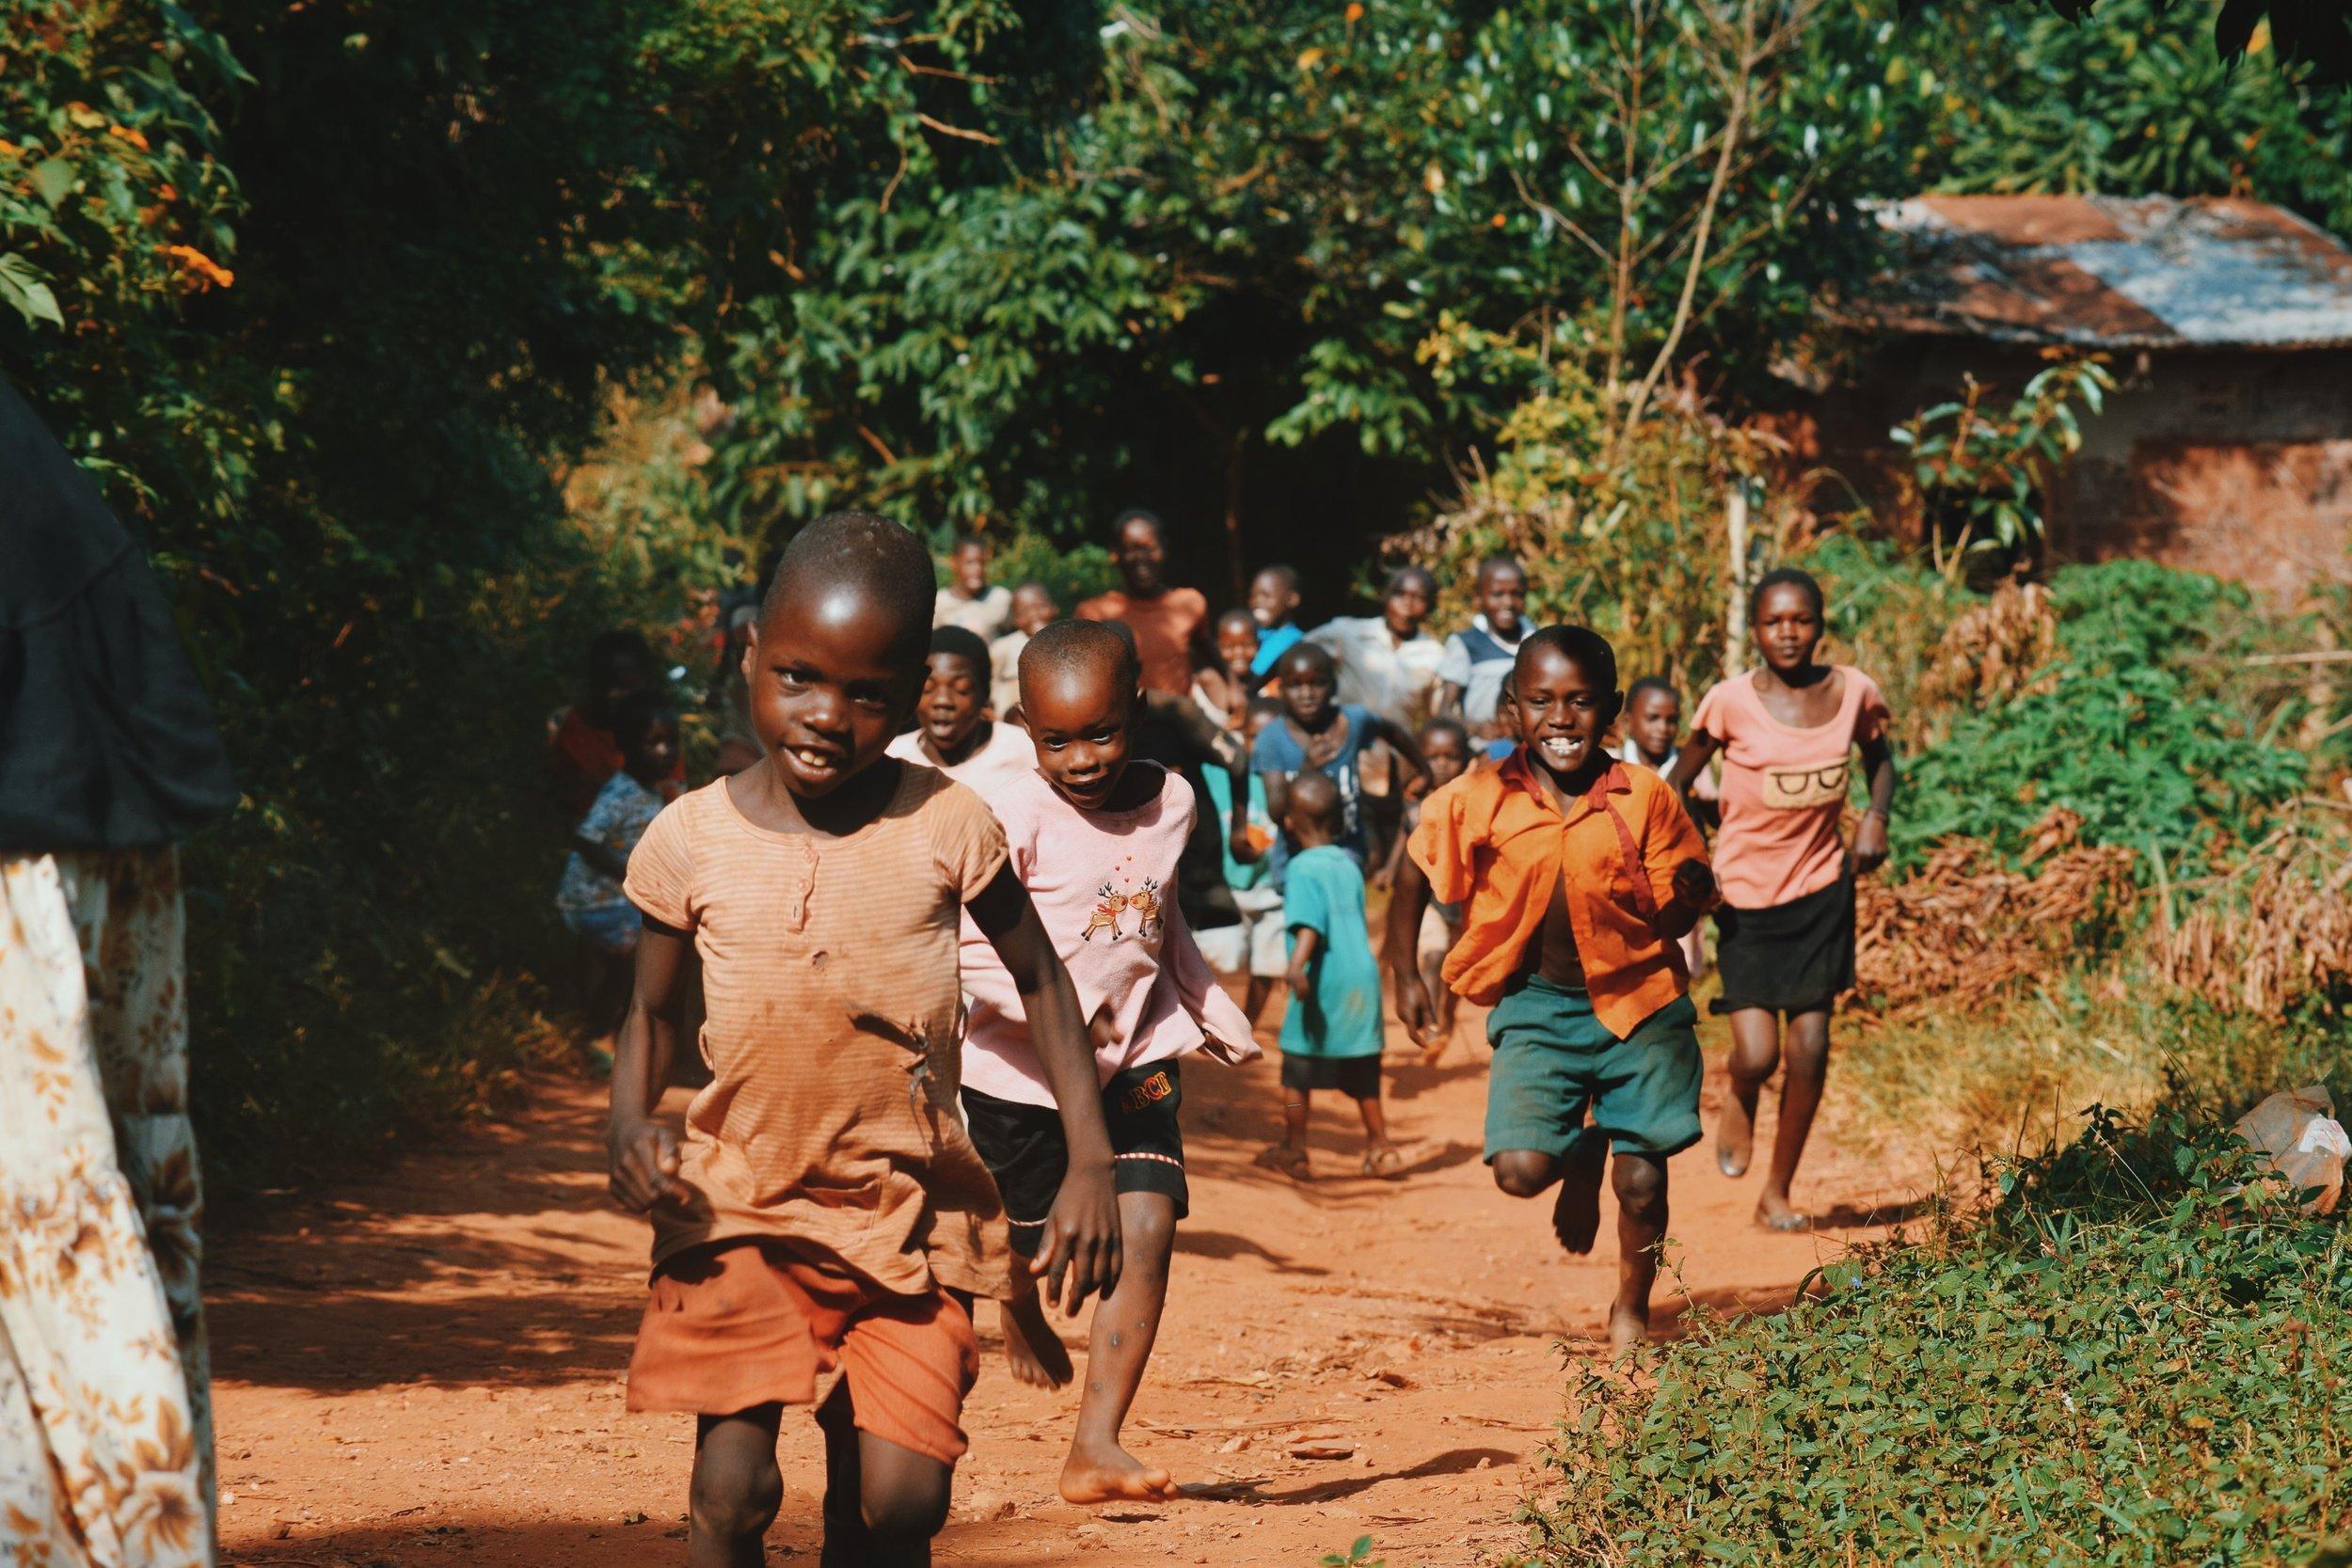 1 physician per 25,000 people - Migori County, Kenya